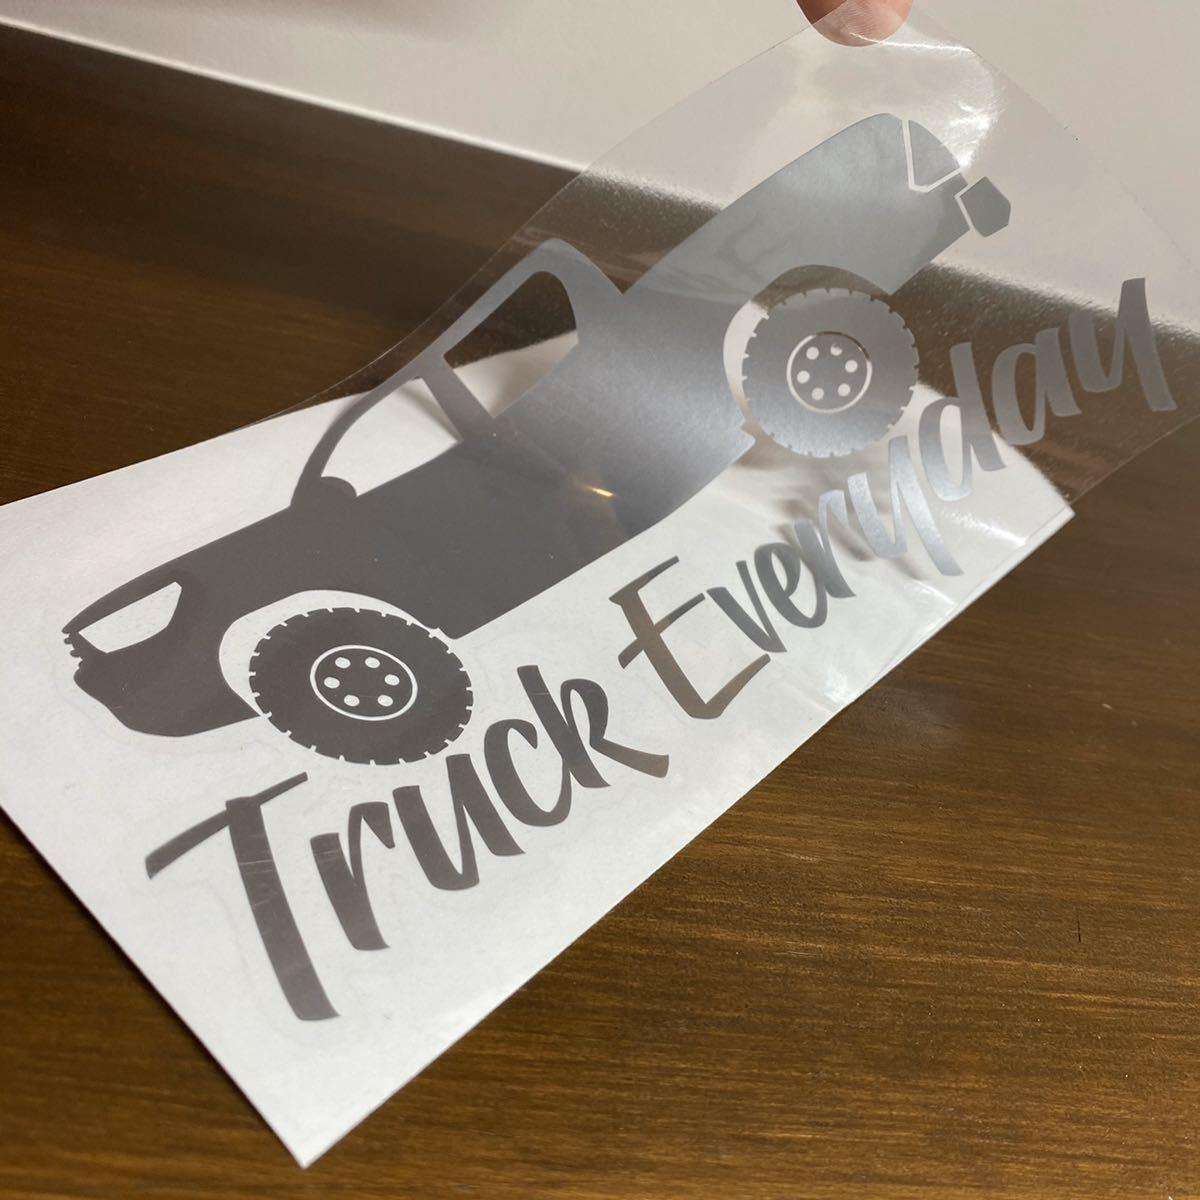 Truck Everyday ハイラックス ステッカー_画像2